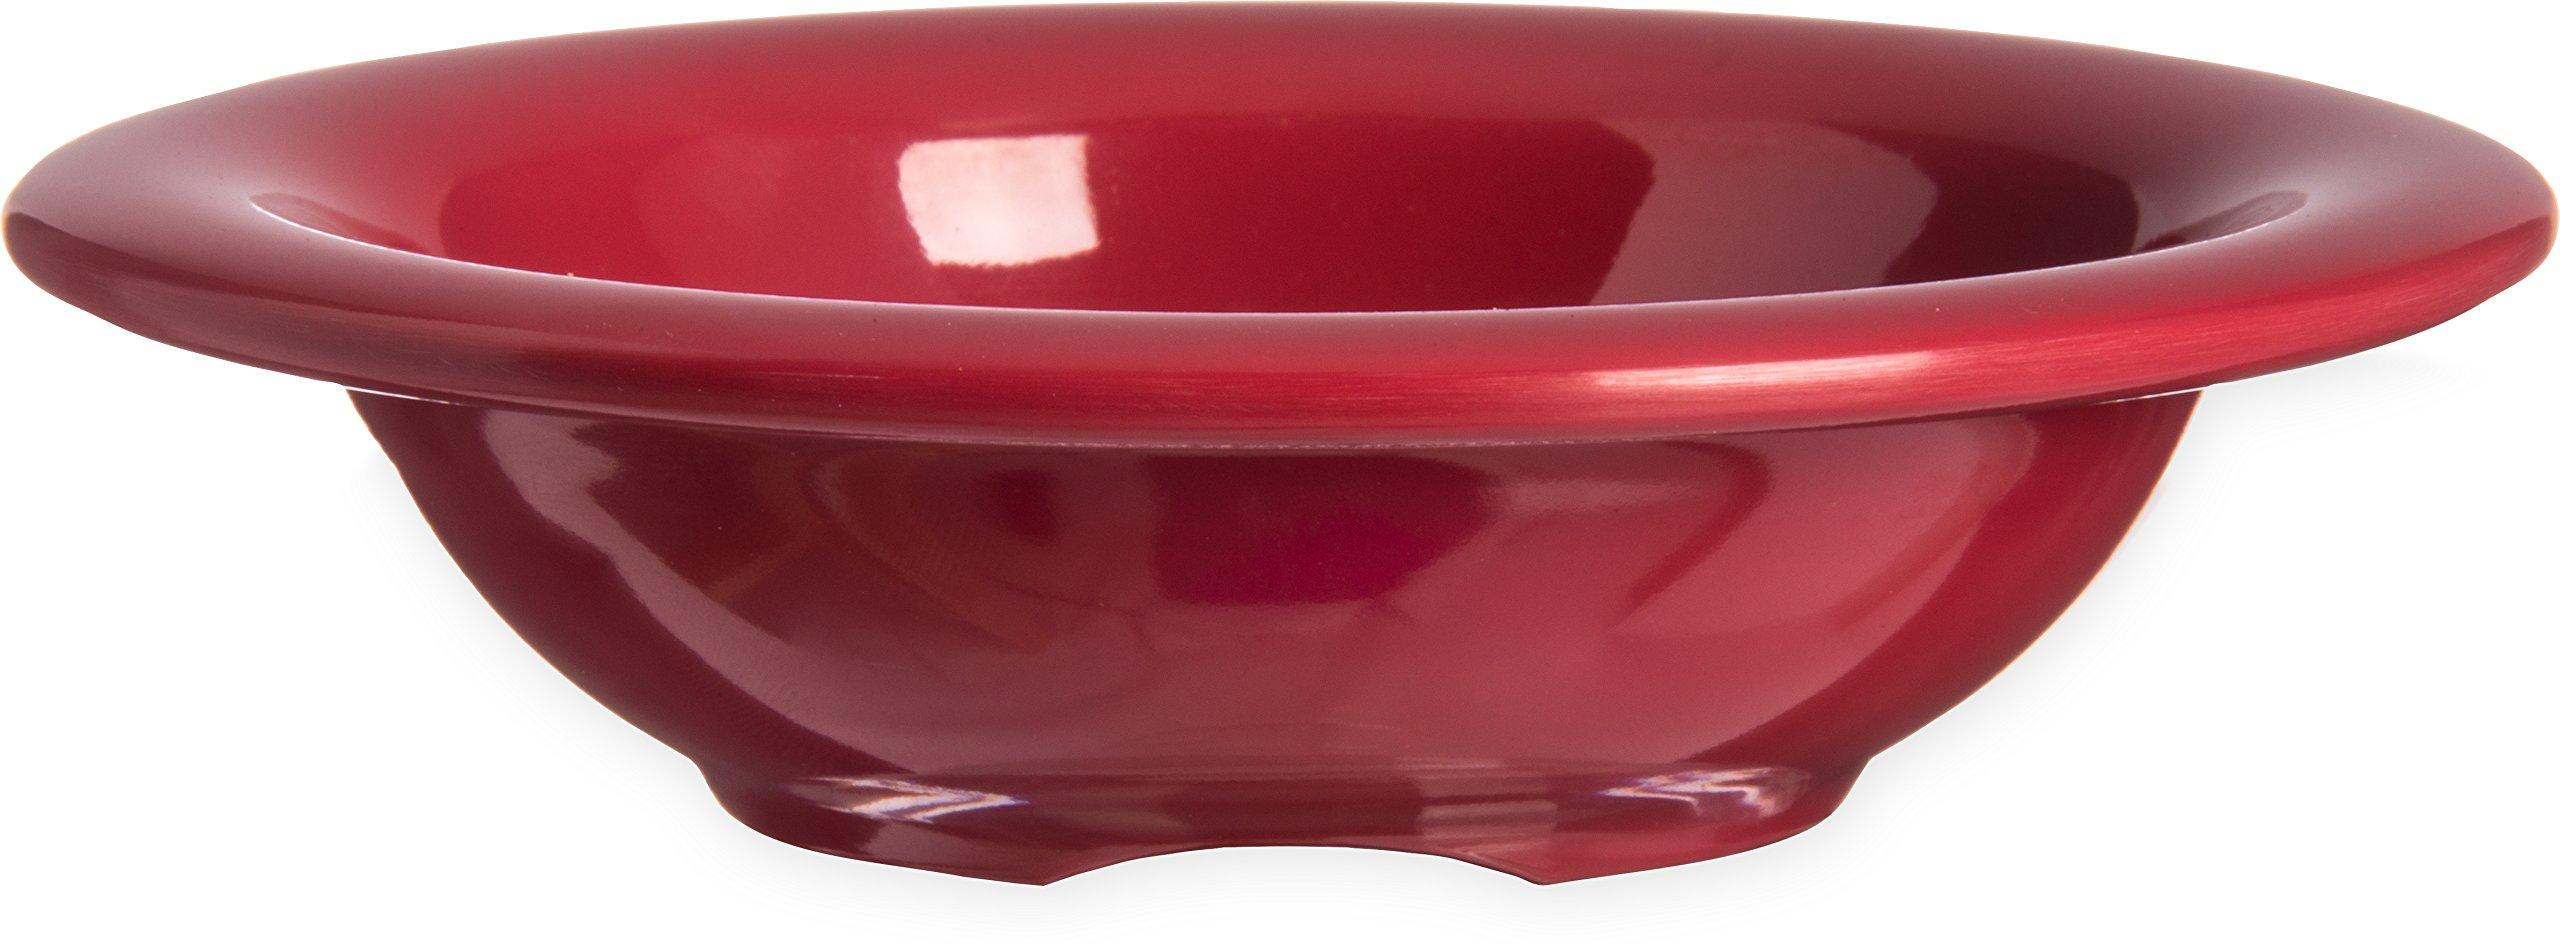 Carlisle 4304258 Durus Rimmed Melamine Fruit Bowl, 4 Oz., Roma Red (Pack of 48)